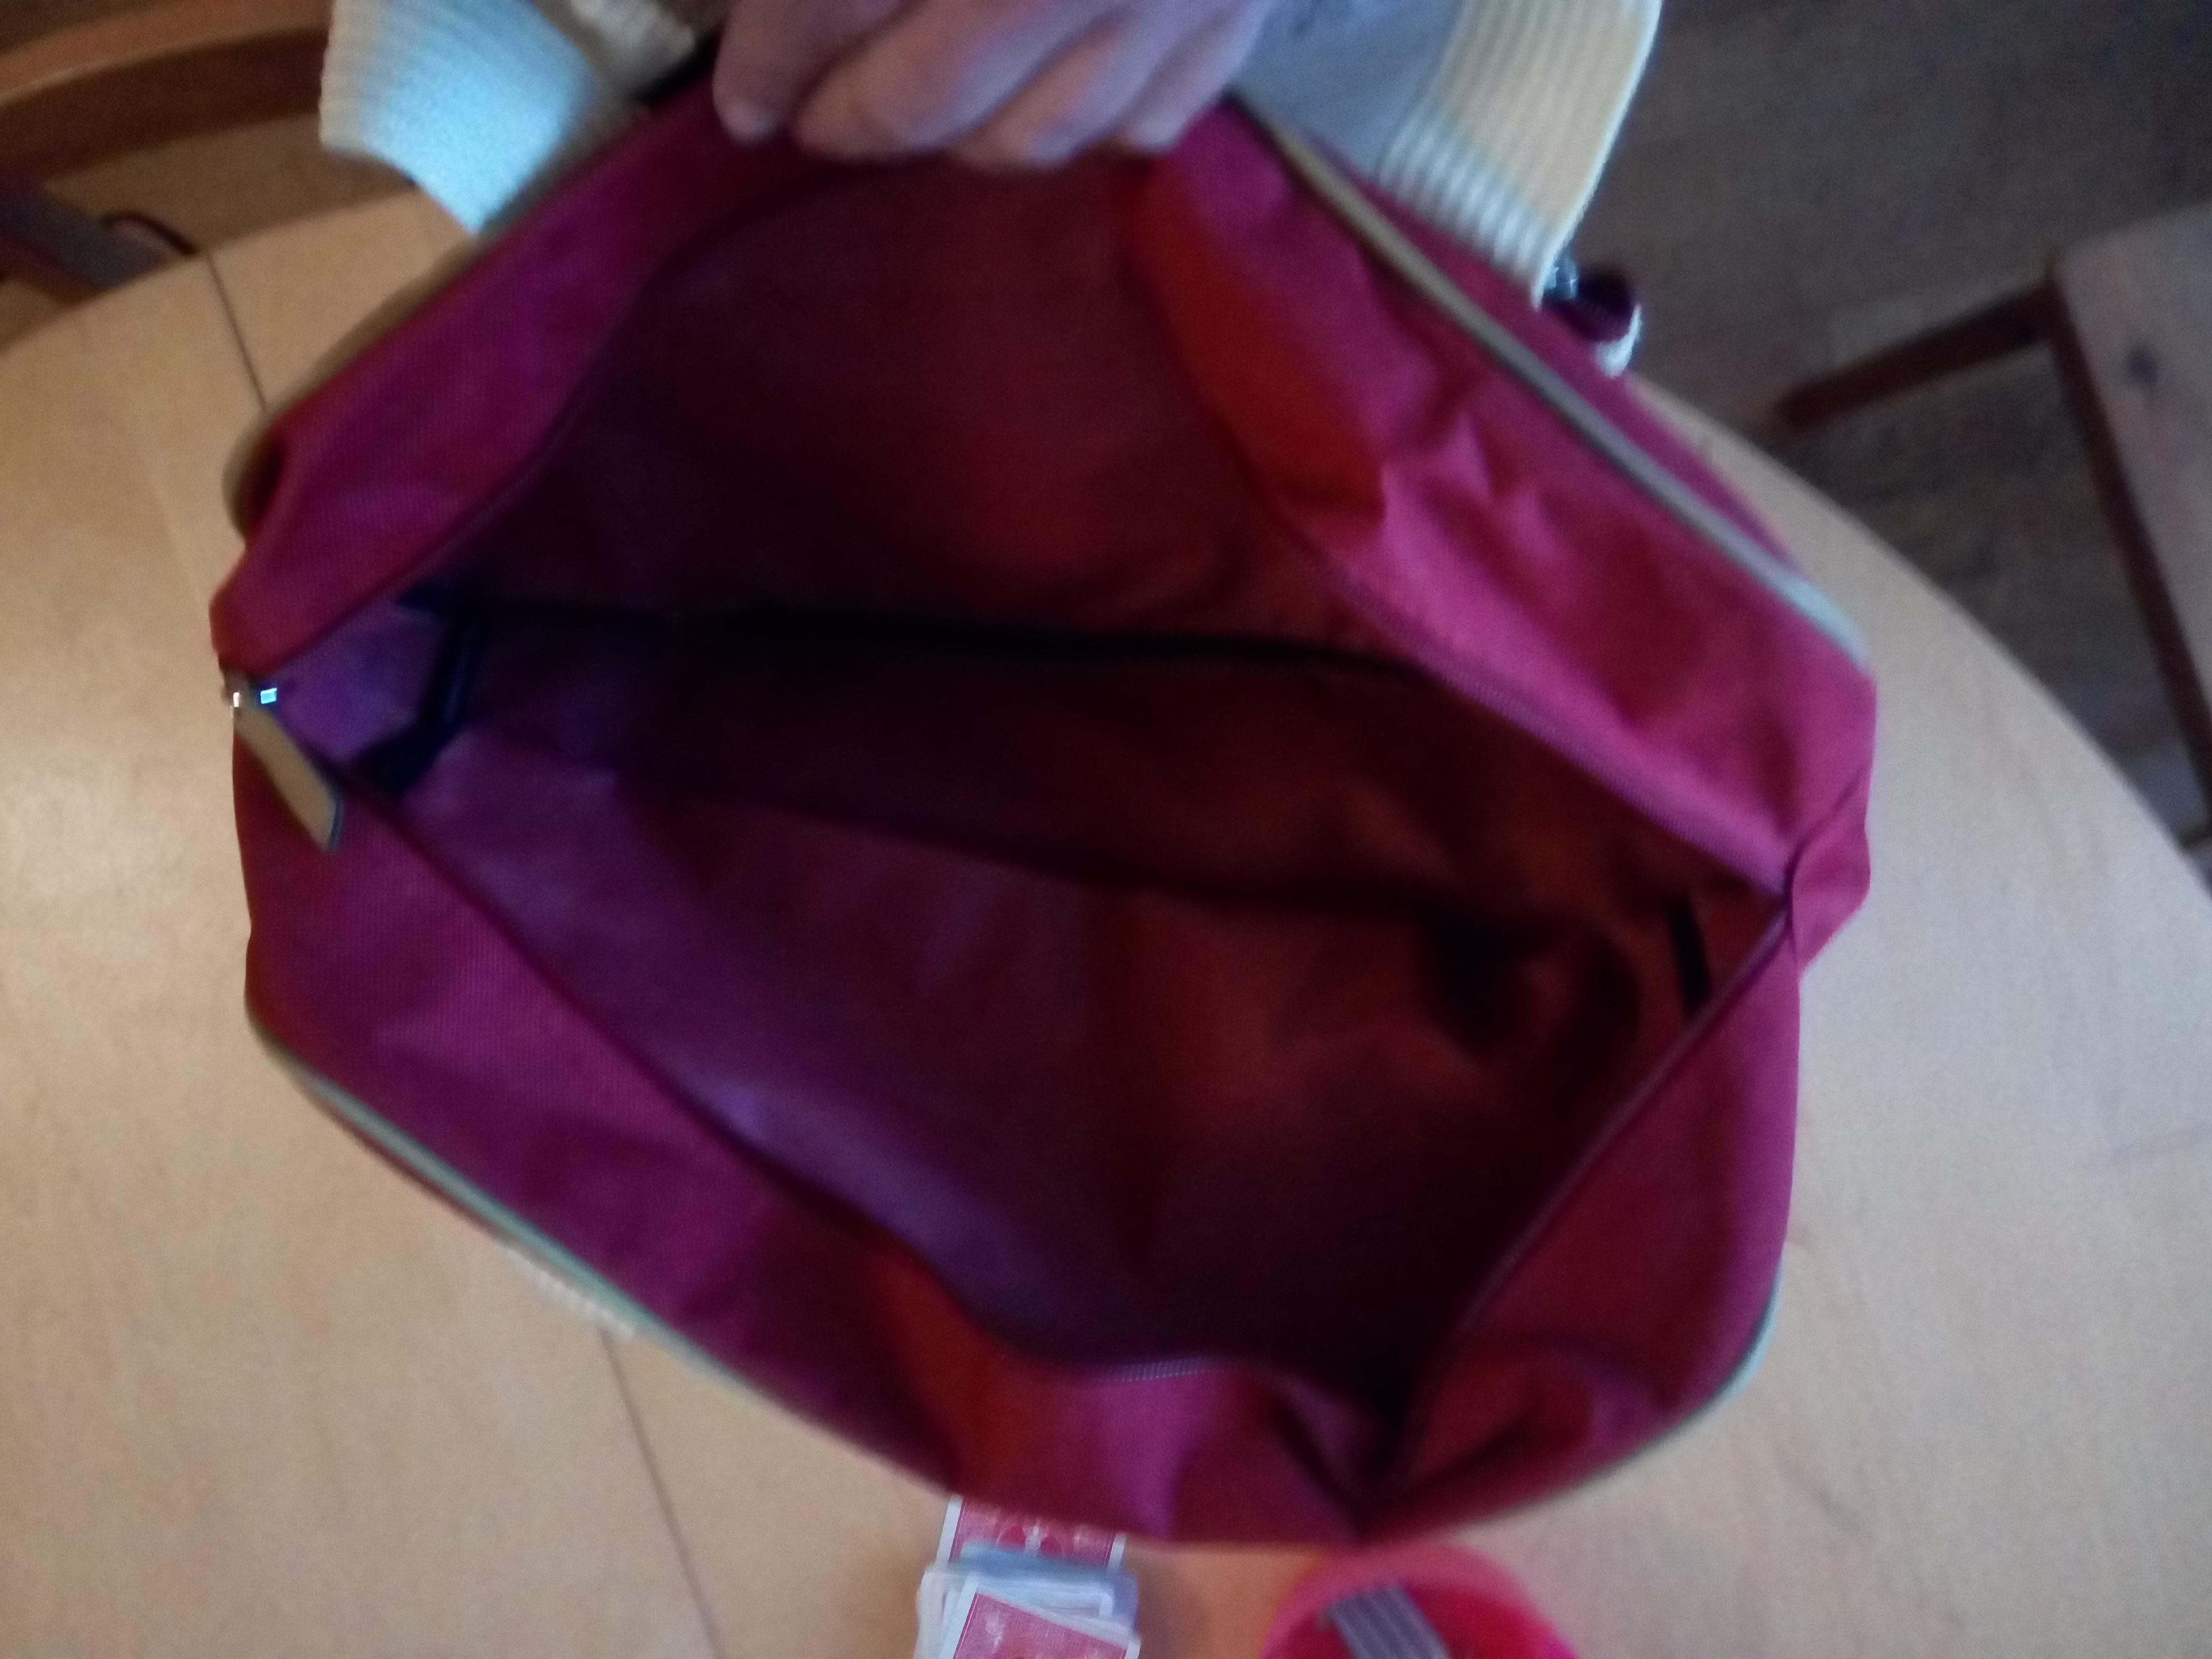 troc de troc reserve sac de transport image 1